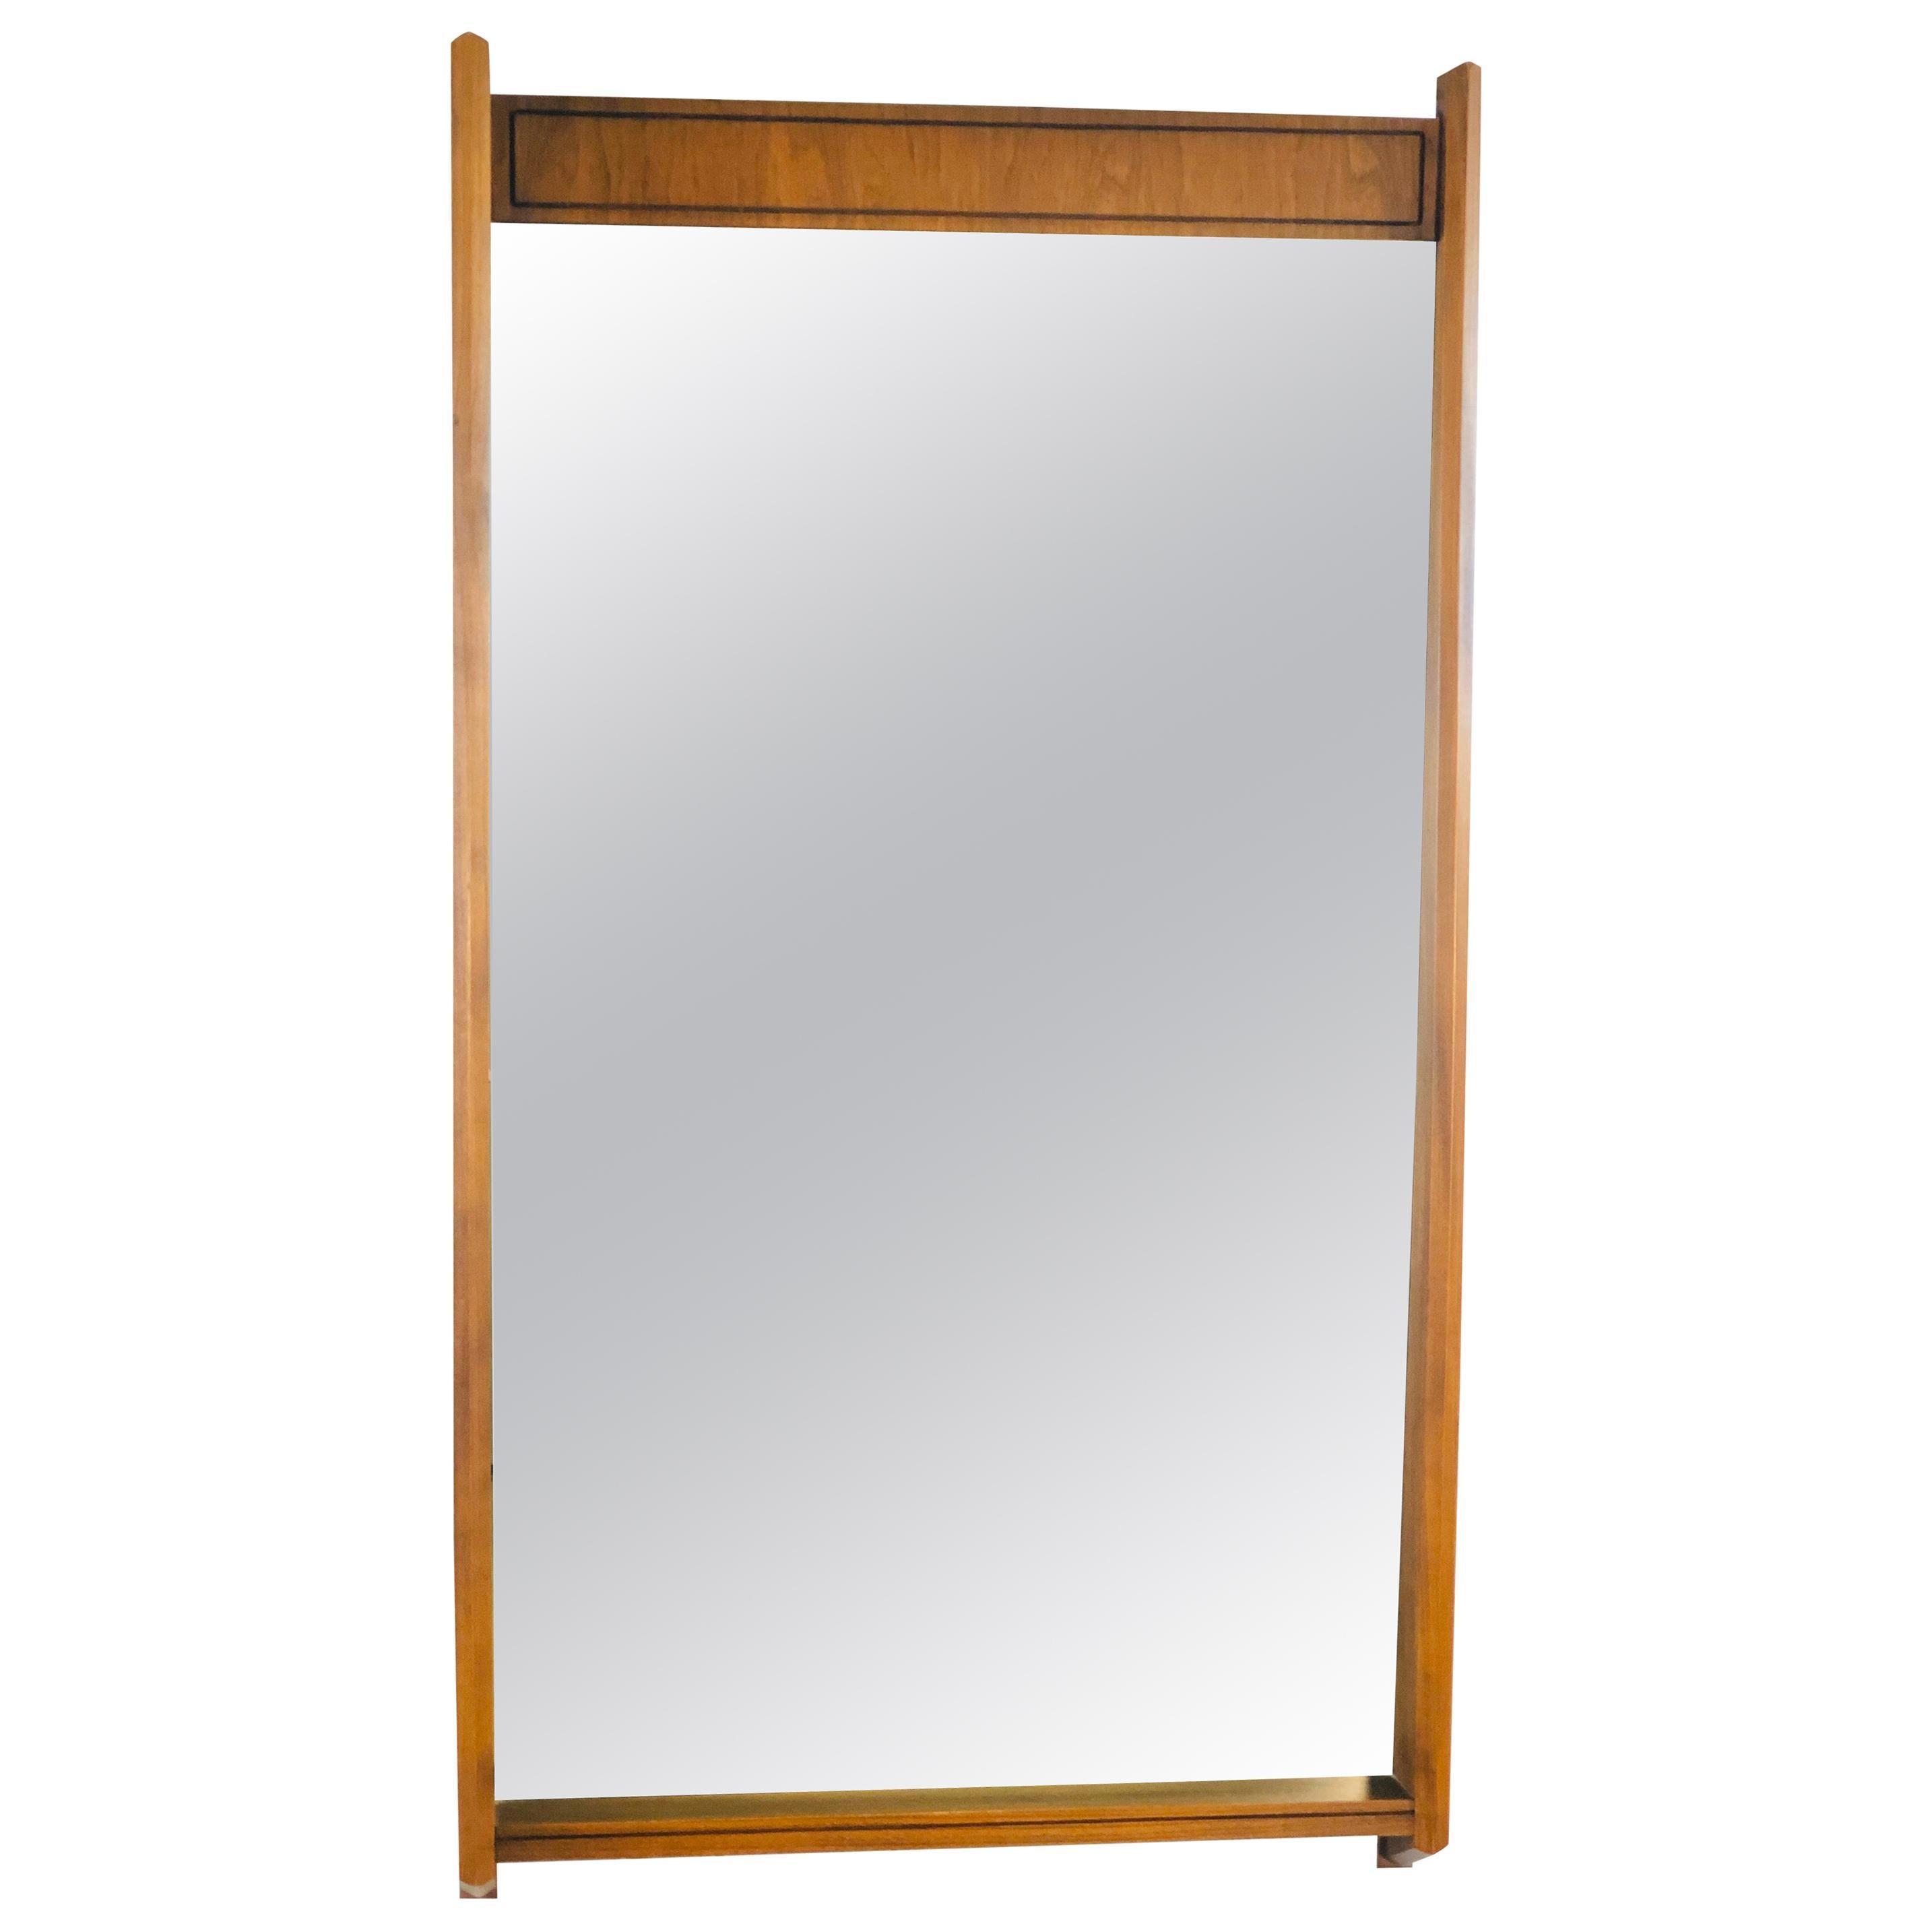 1960s Walnut Angled Front Wall Mirror